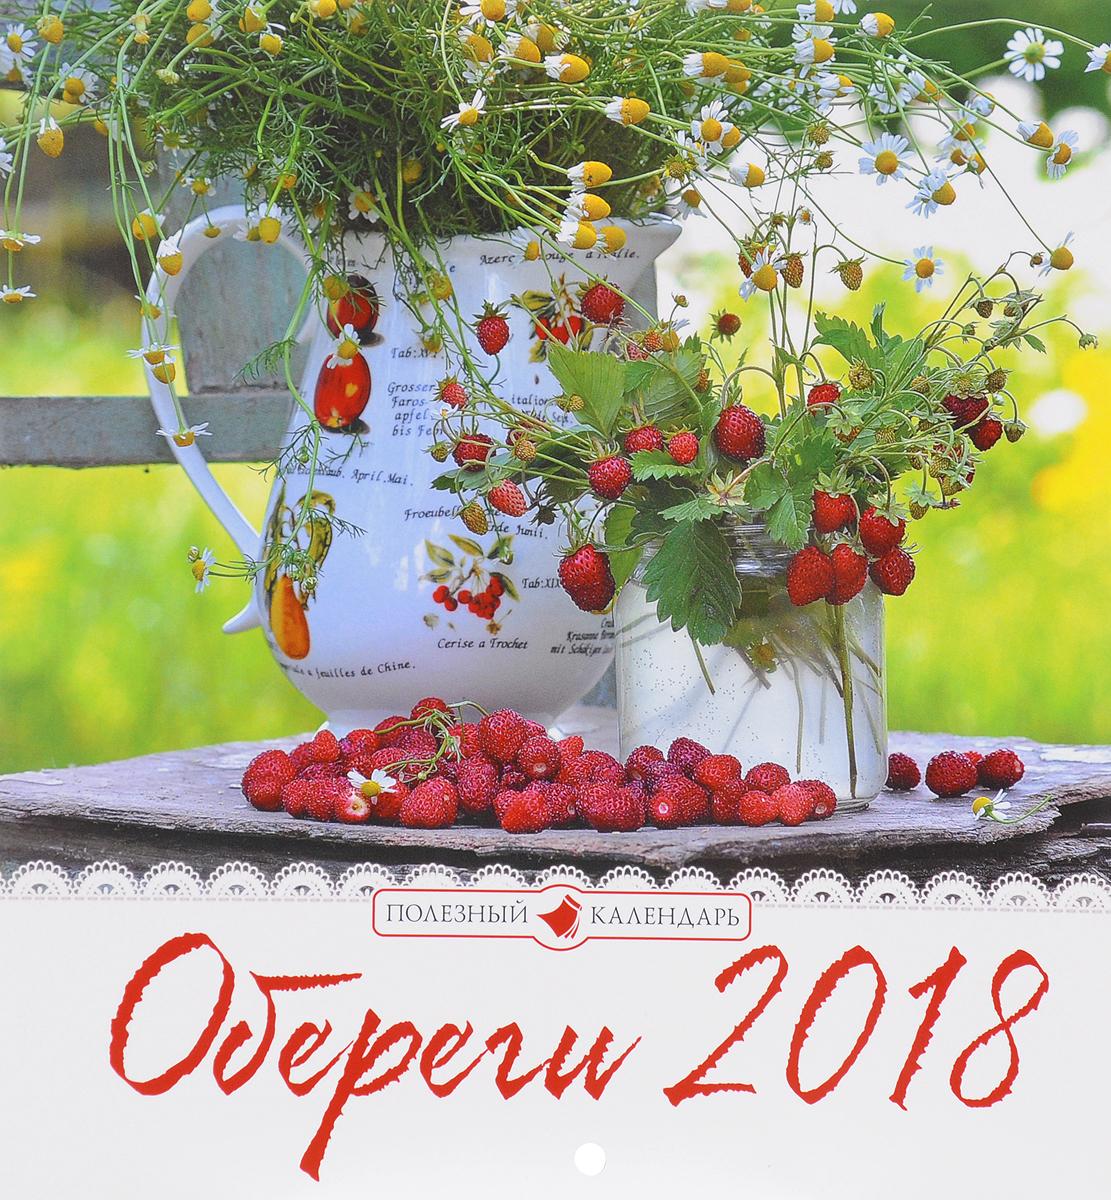 Календарь на 2018 год (на скрепке). Обереги